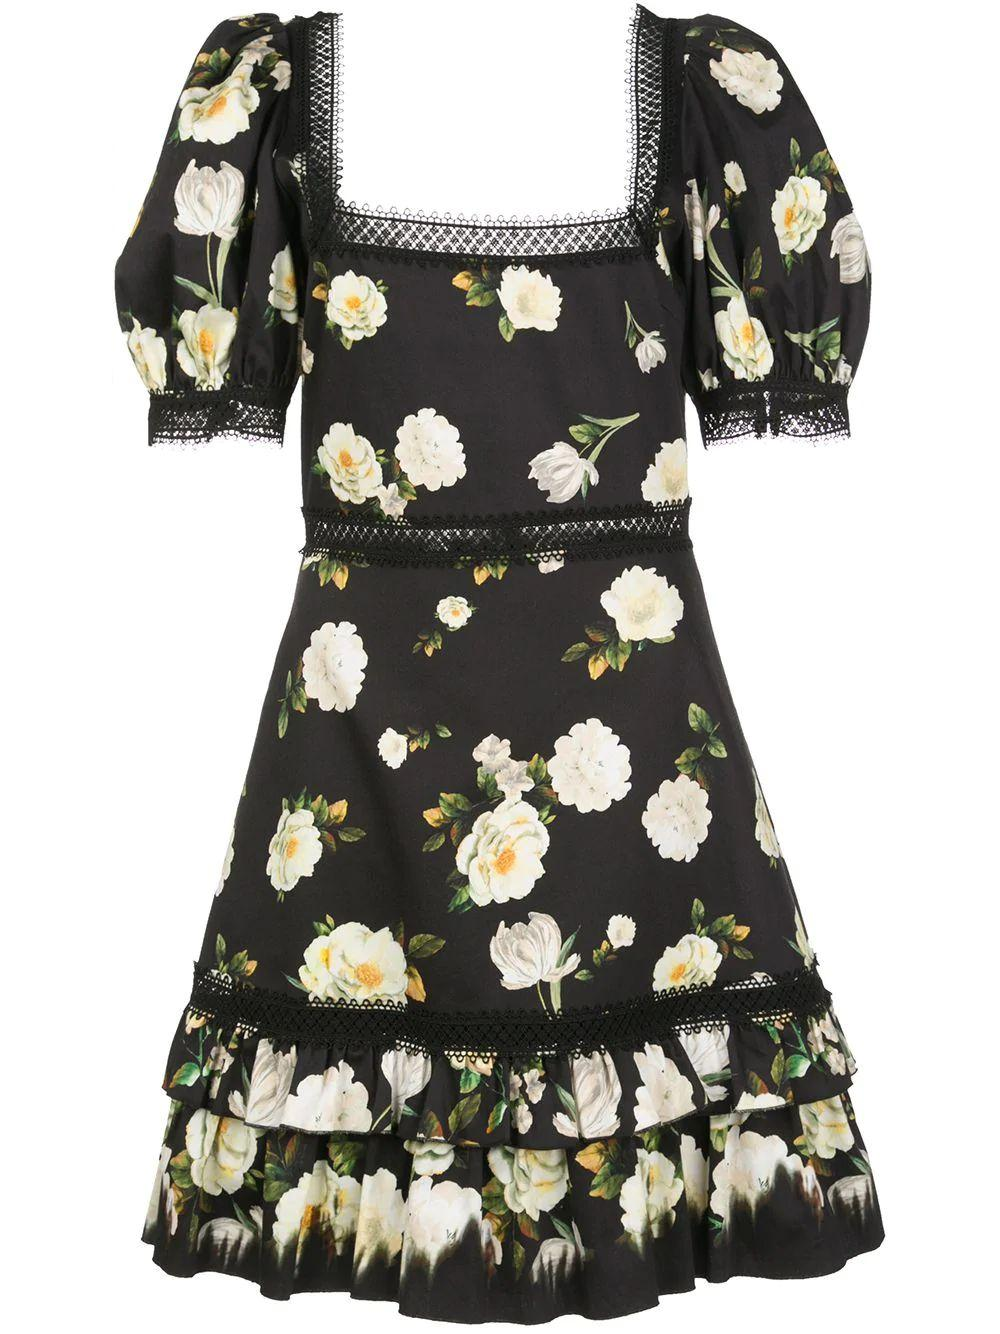 Wylie Square Neck Puff Sleeve Mini Dress Item # CC002P96536